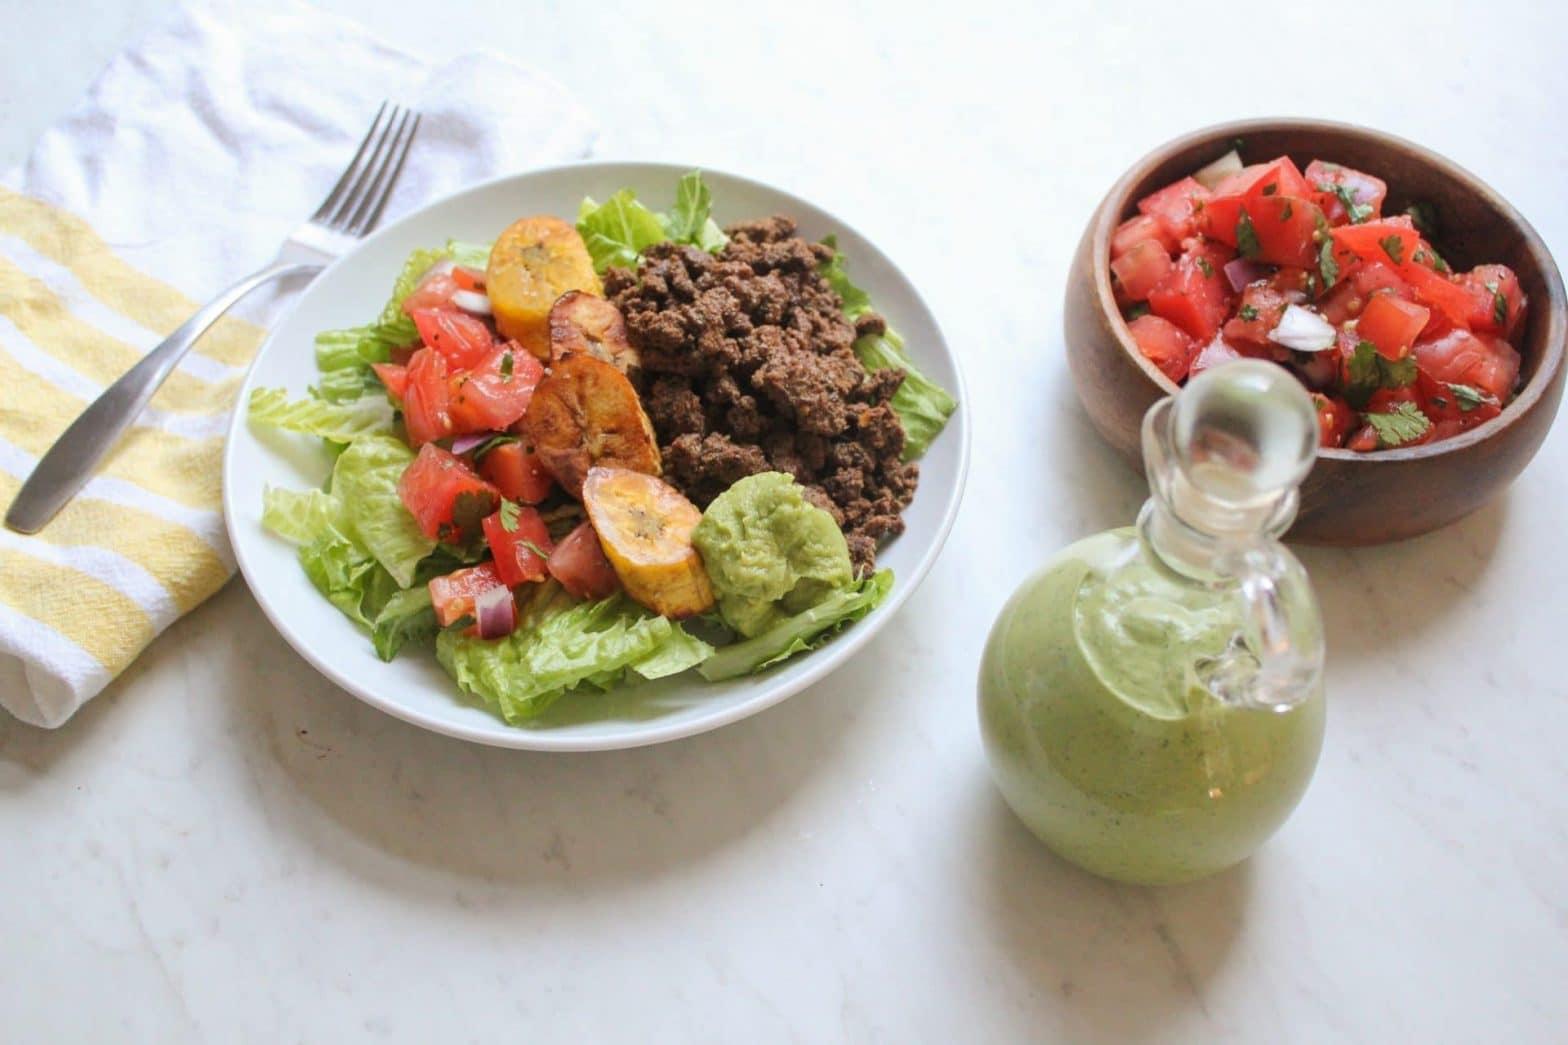 Paleo Taco Salad Recipe with Green Goddess Dressing